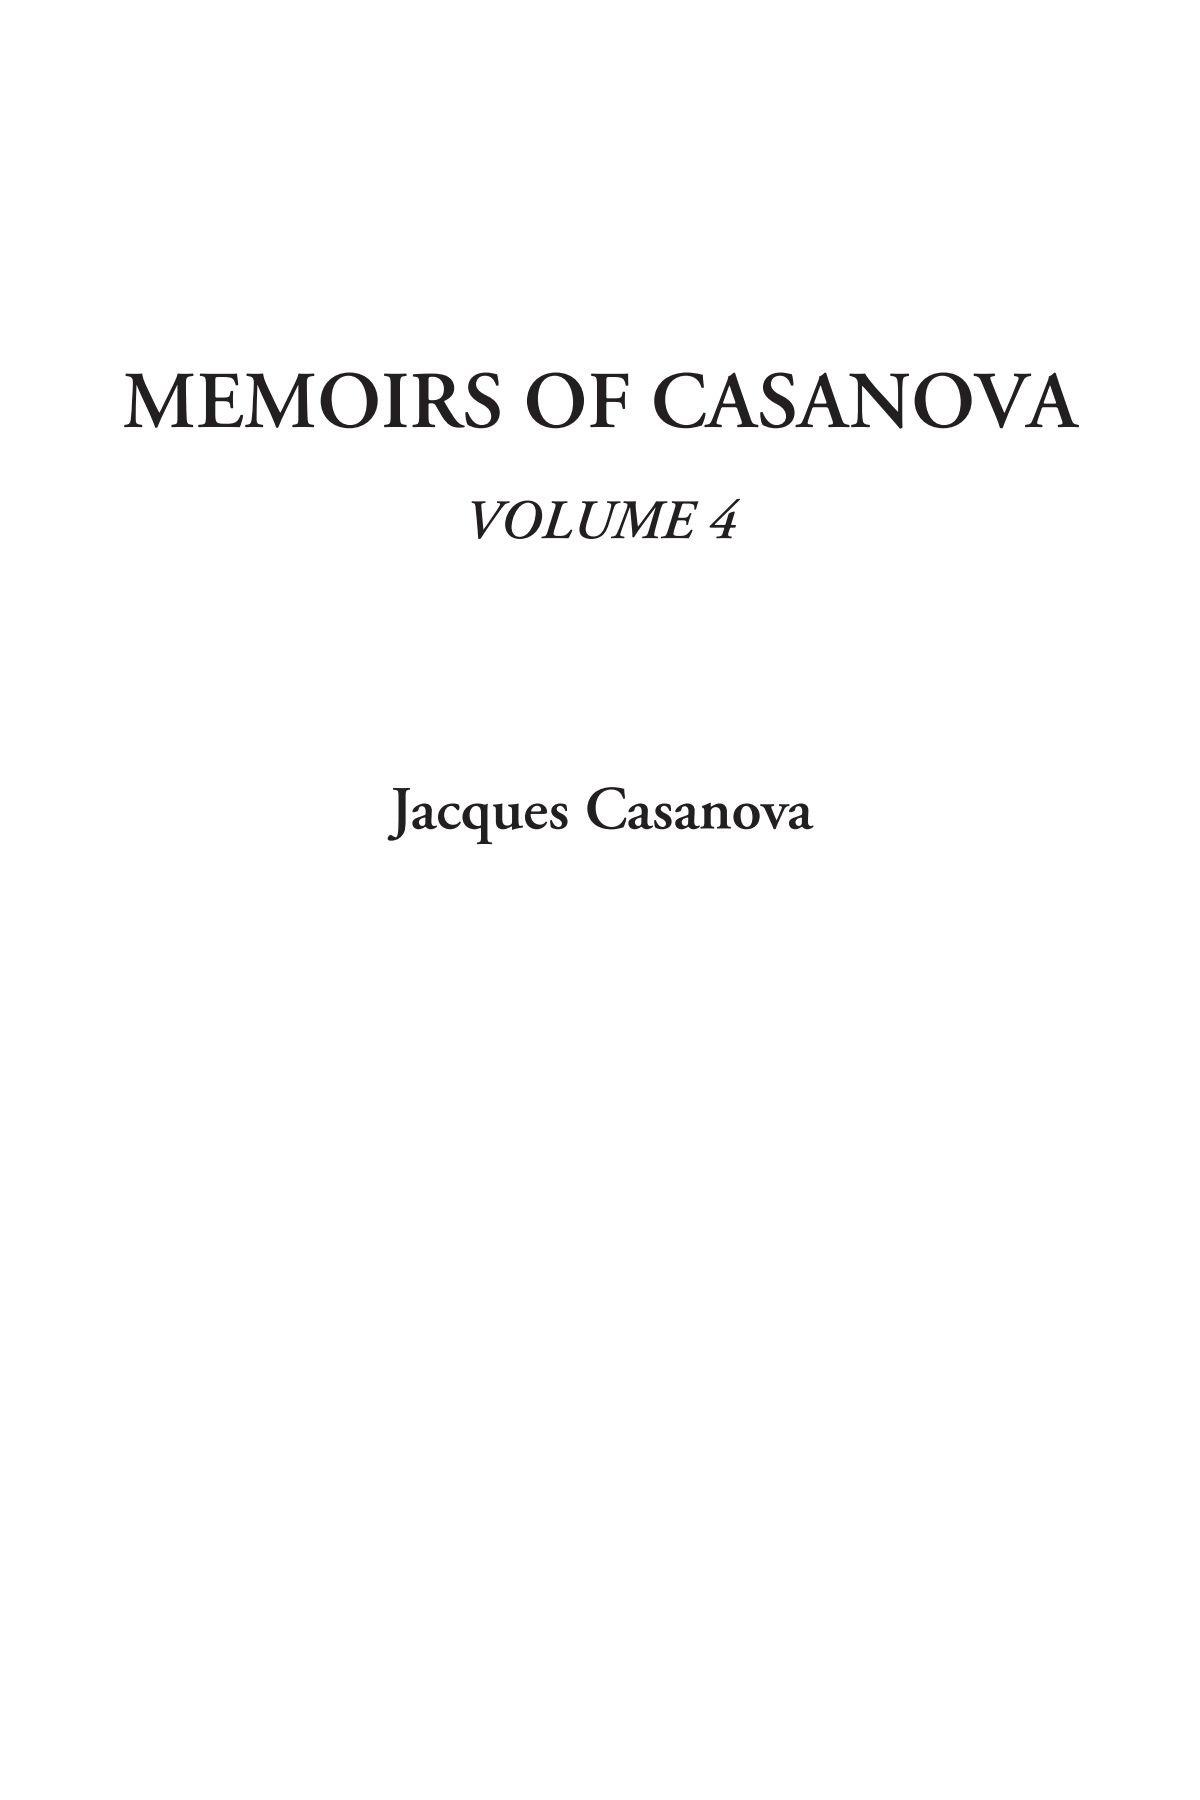 Download Memoirs of Casanova, Volume 4 PDF